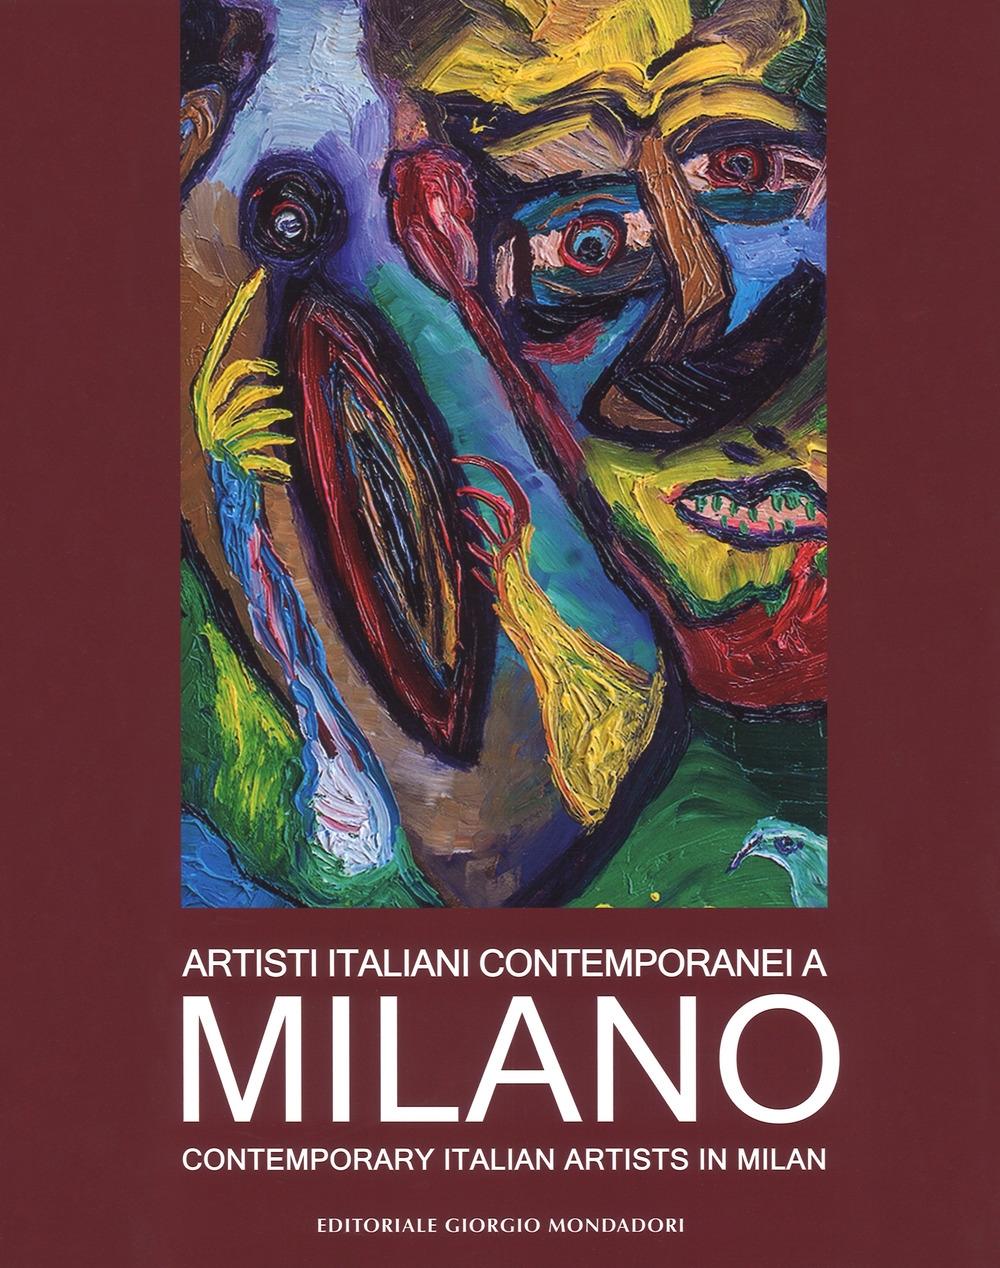 Artisti Contemporanei a Milano. Contemporary Italian Artists in Milan.